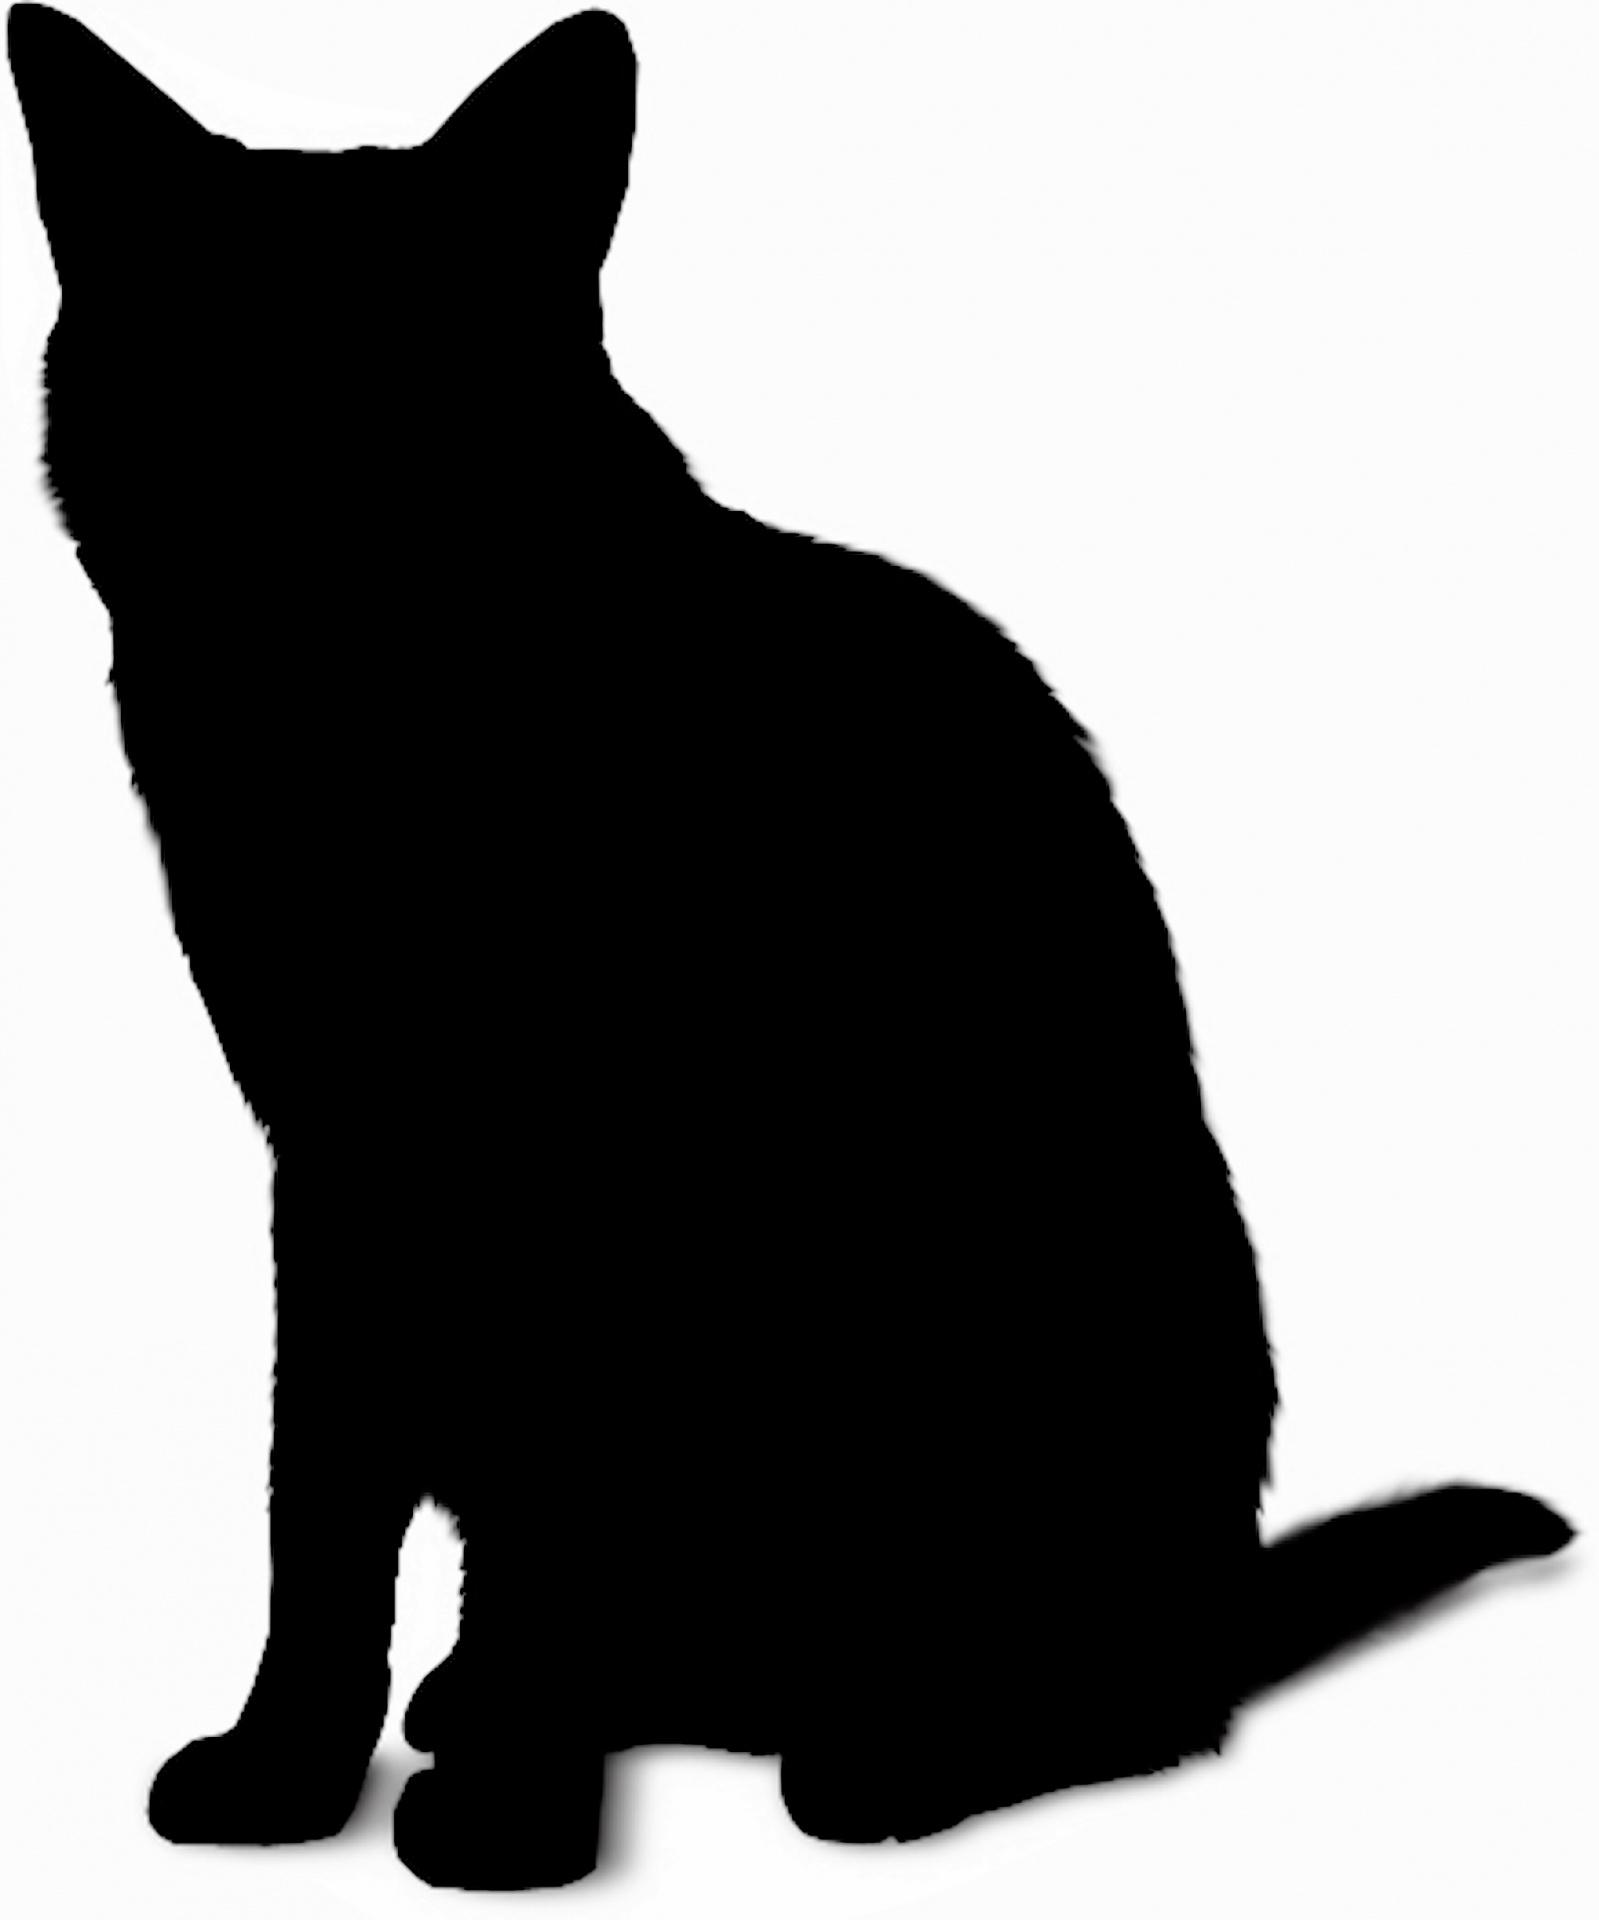 1599x1920 Silhouette Cat Free Stock Photo